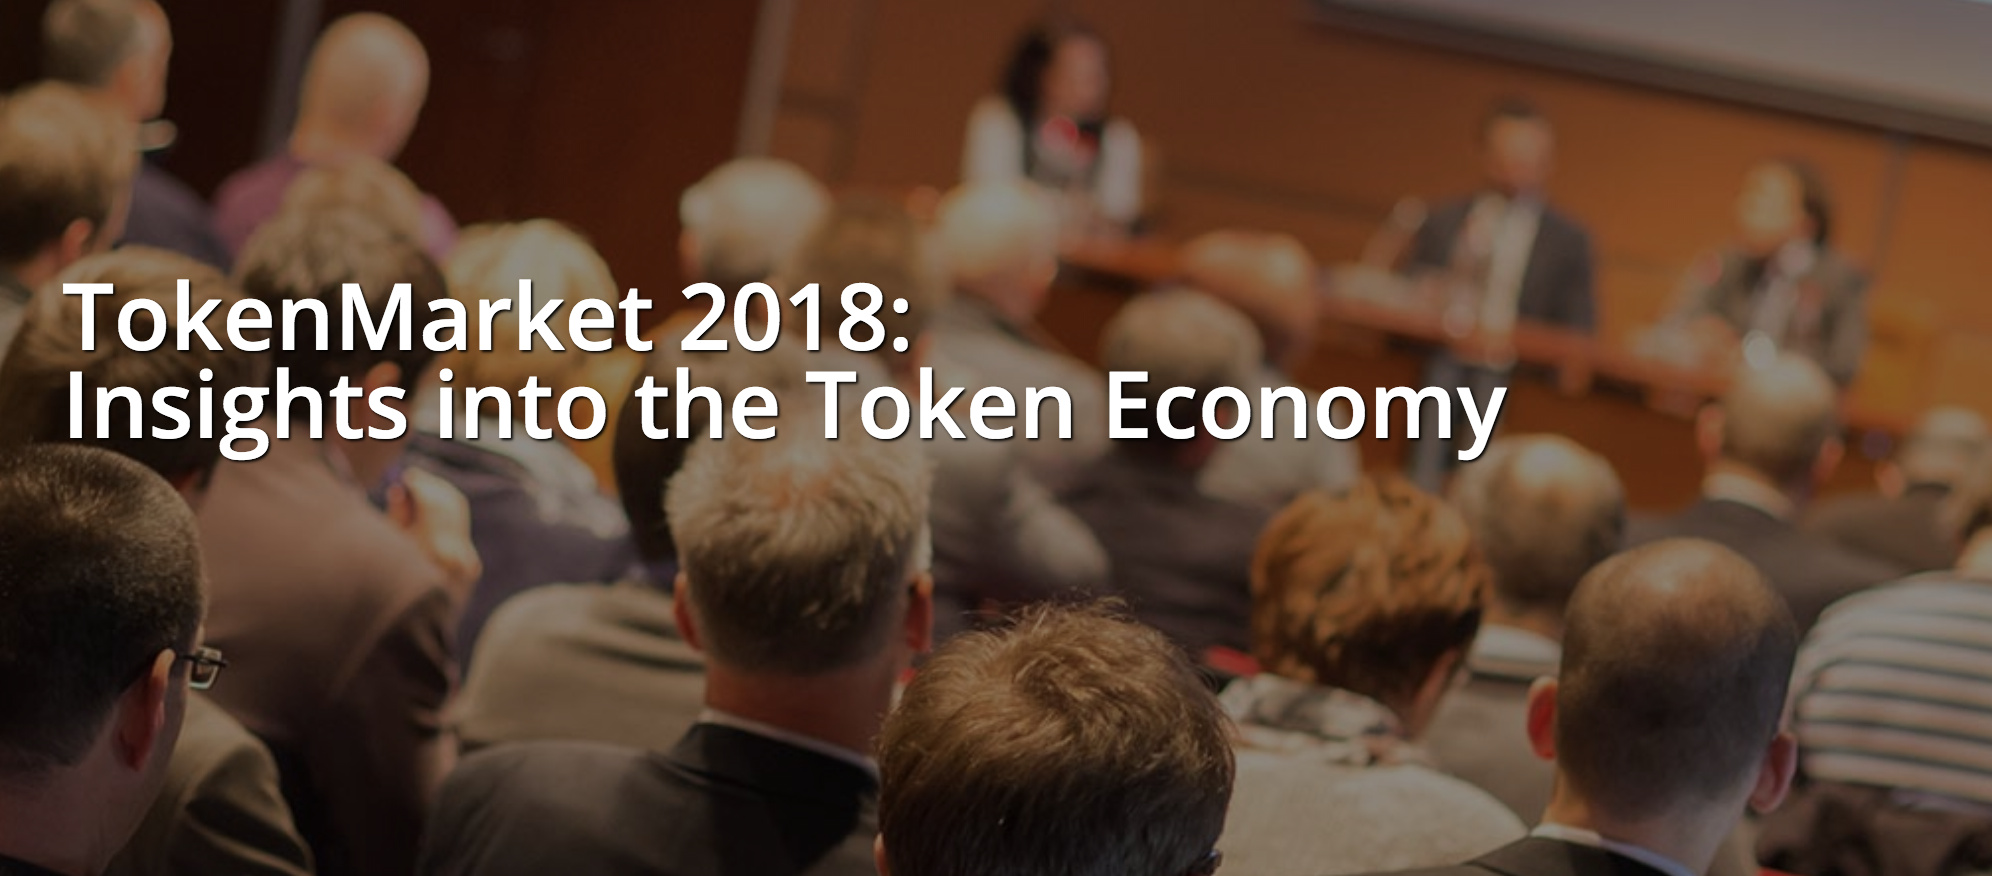 Token market conference